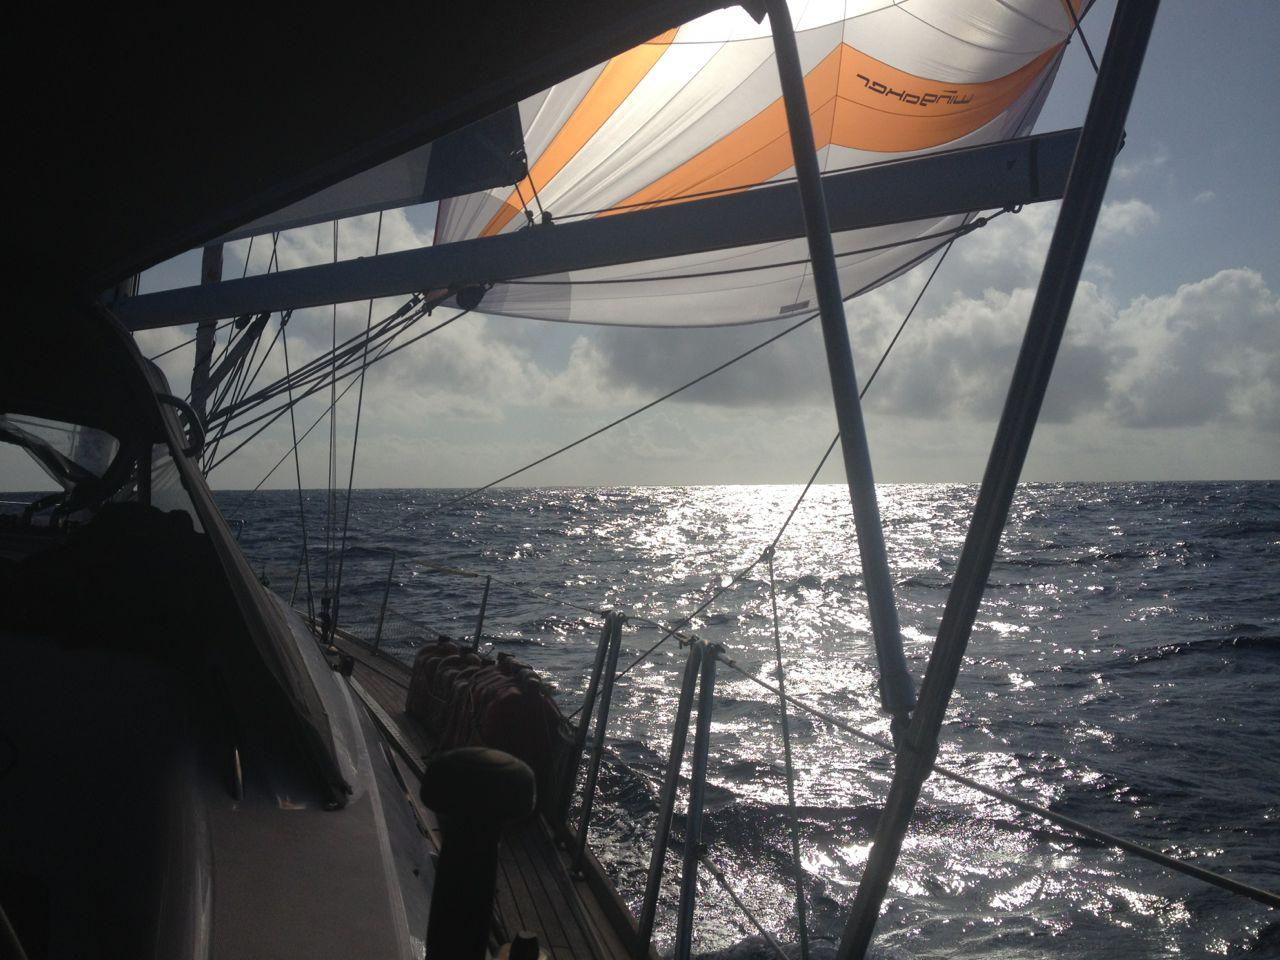 Wingaker fahren auf der hapa na sasa